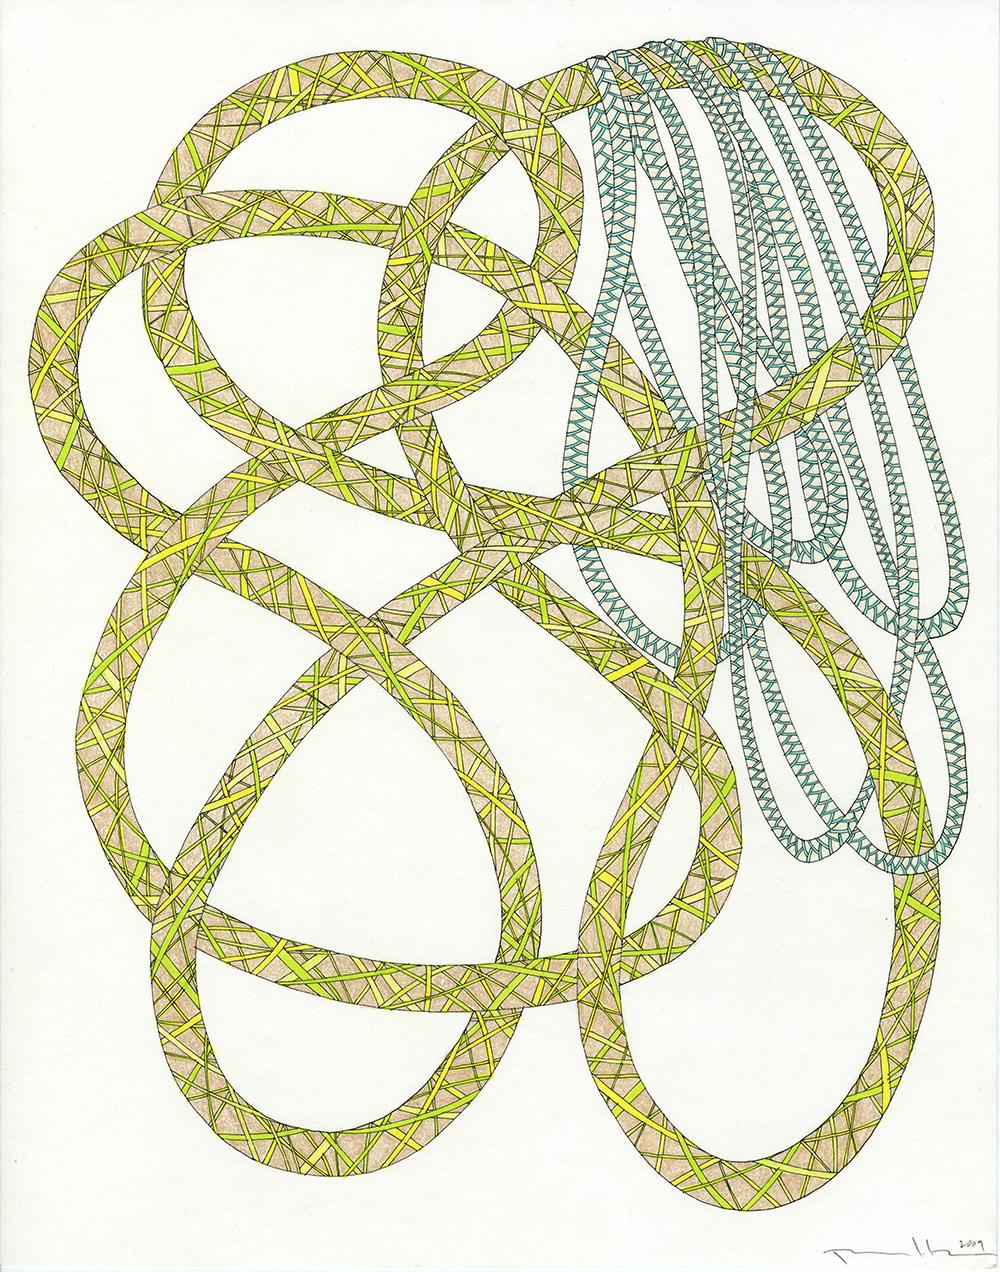 Ropes in Green, Yellow, Tan, & Aqua_11x14_2009_CC.jpg